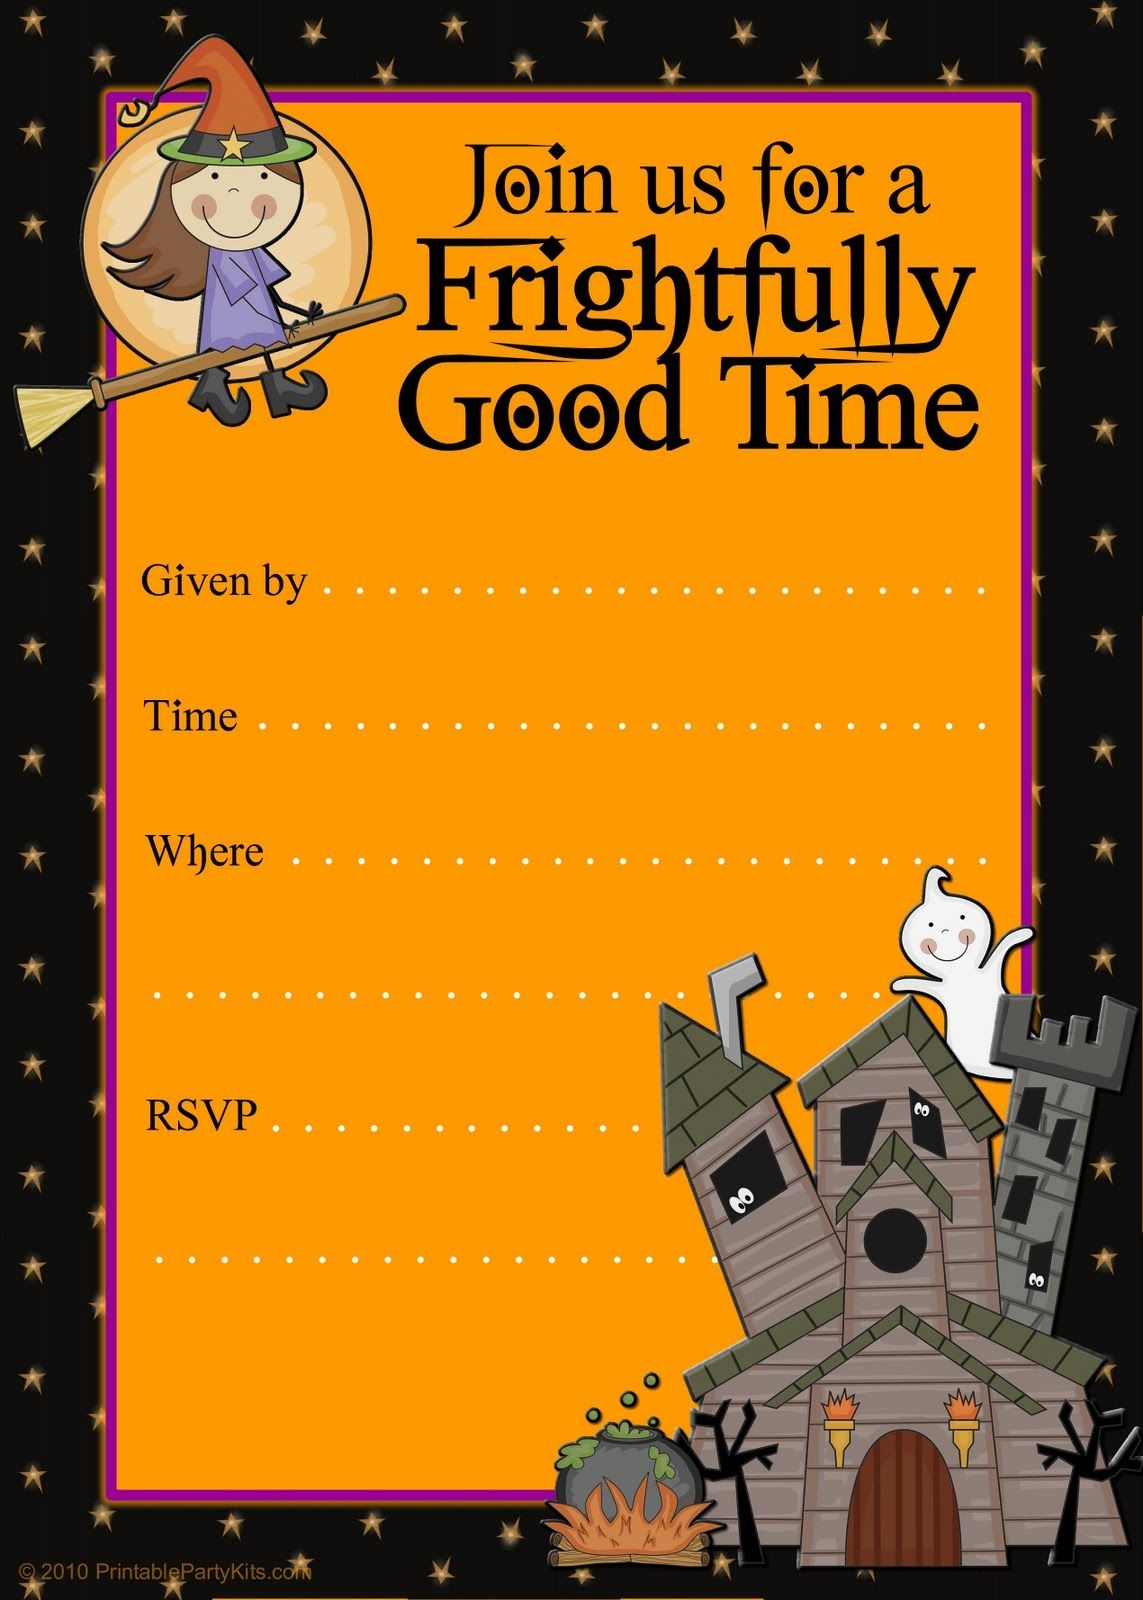 Free Halloween Flyer Invitations Printable | Food | Halloween Party - Free Printable Halloween Flyer Templates